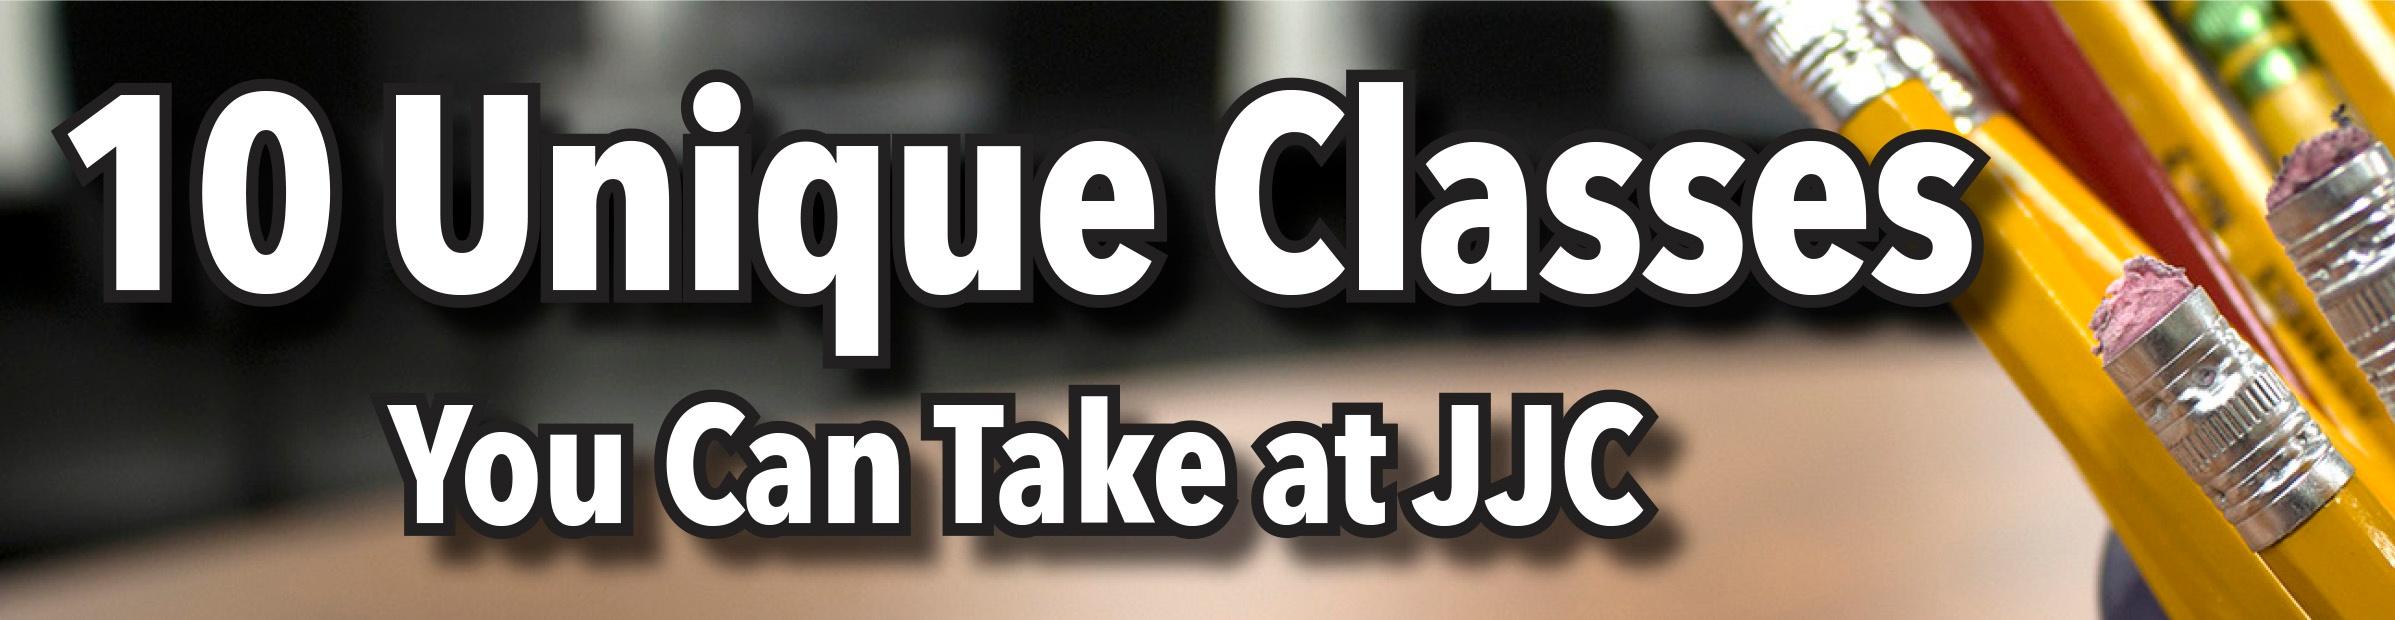 10 unique classes you can take at jjc joliet junior college